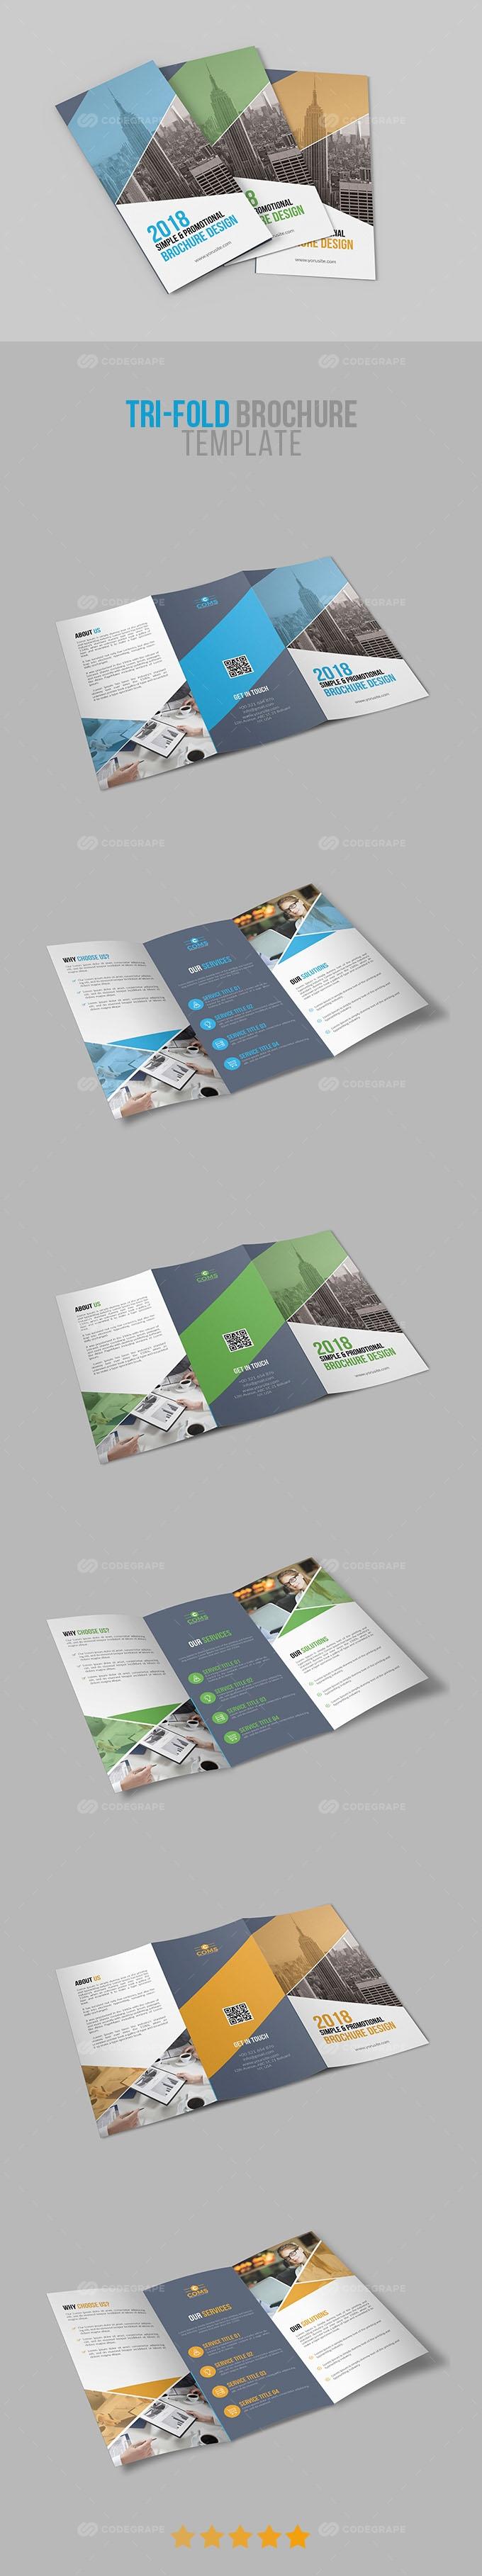 Corporate Tri-Fold Brochure Template 03